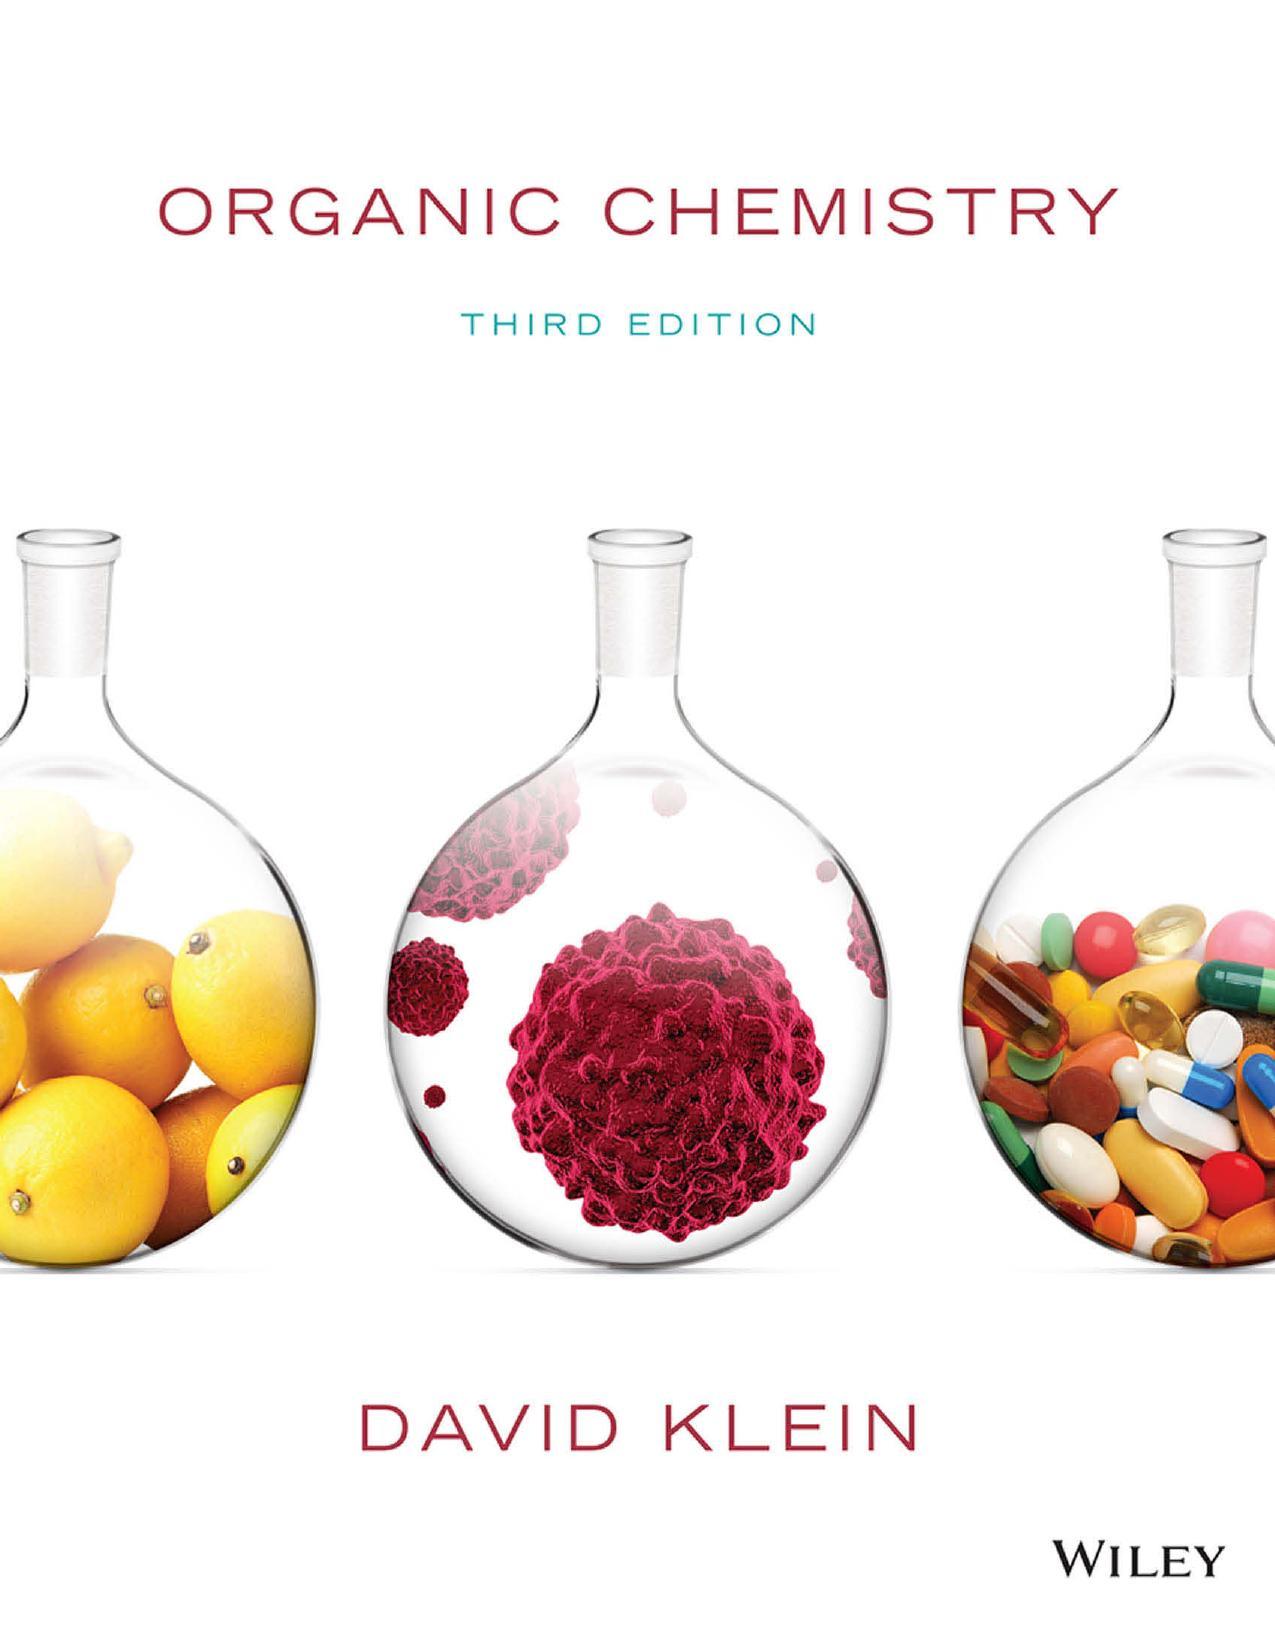 Organic Chemistry Janice Smith 3rd Edition Solutions Manual.zip chioshan Organic%20Chemistry,%203rd%20Edition